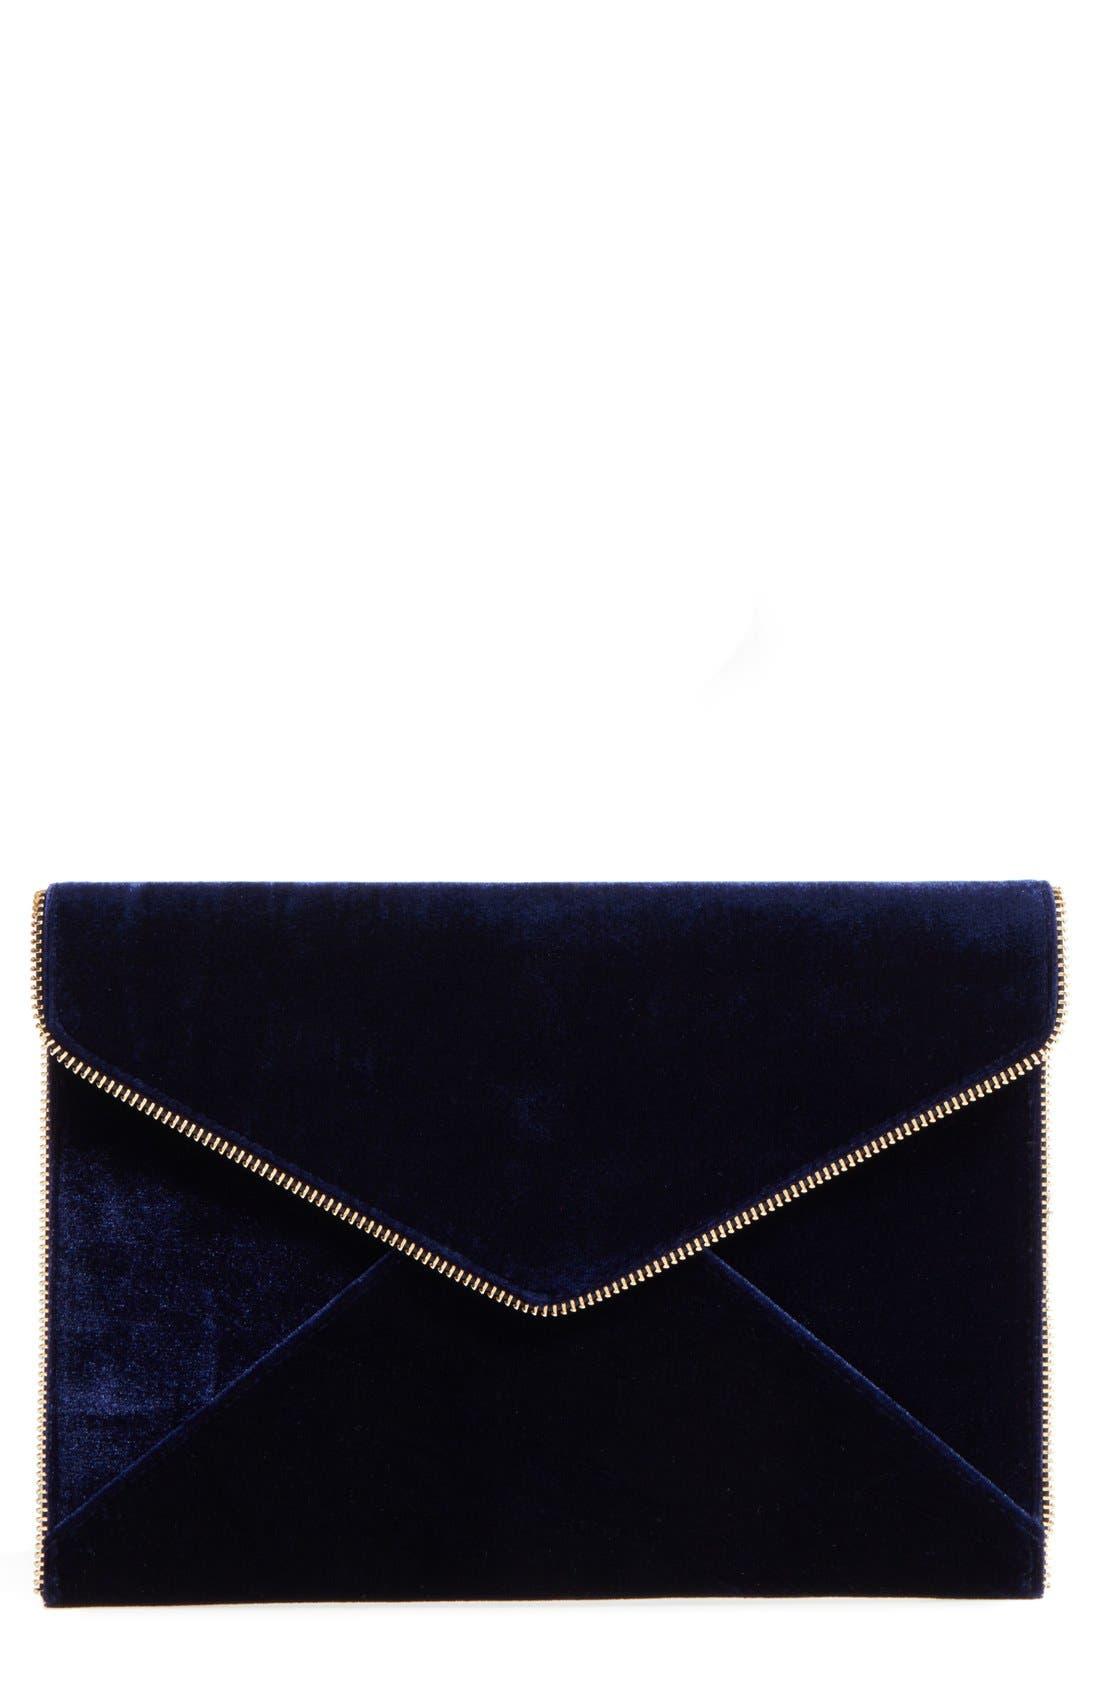 Main Image - Rebecca Minkoff Leo Velvet Envelope Clutch